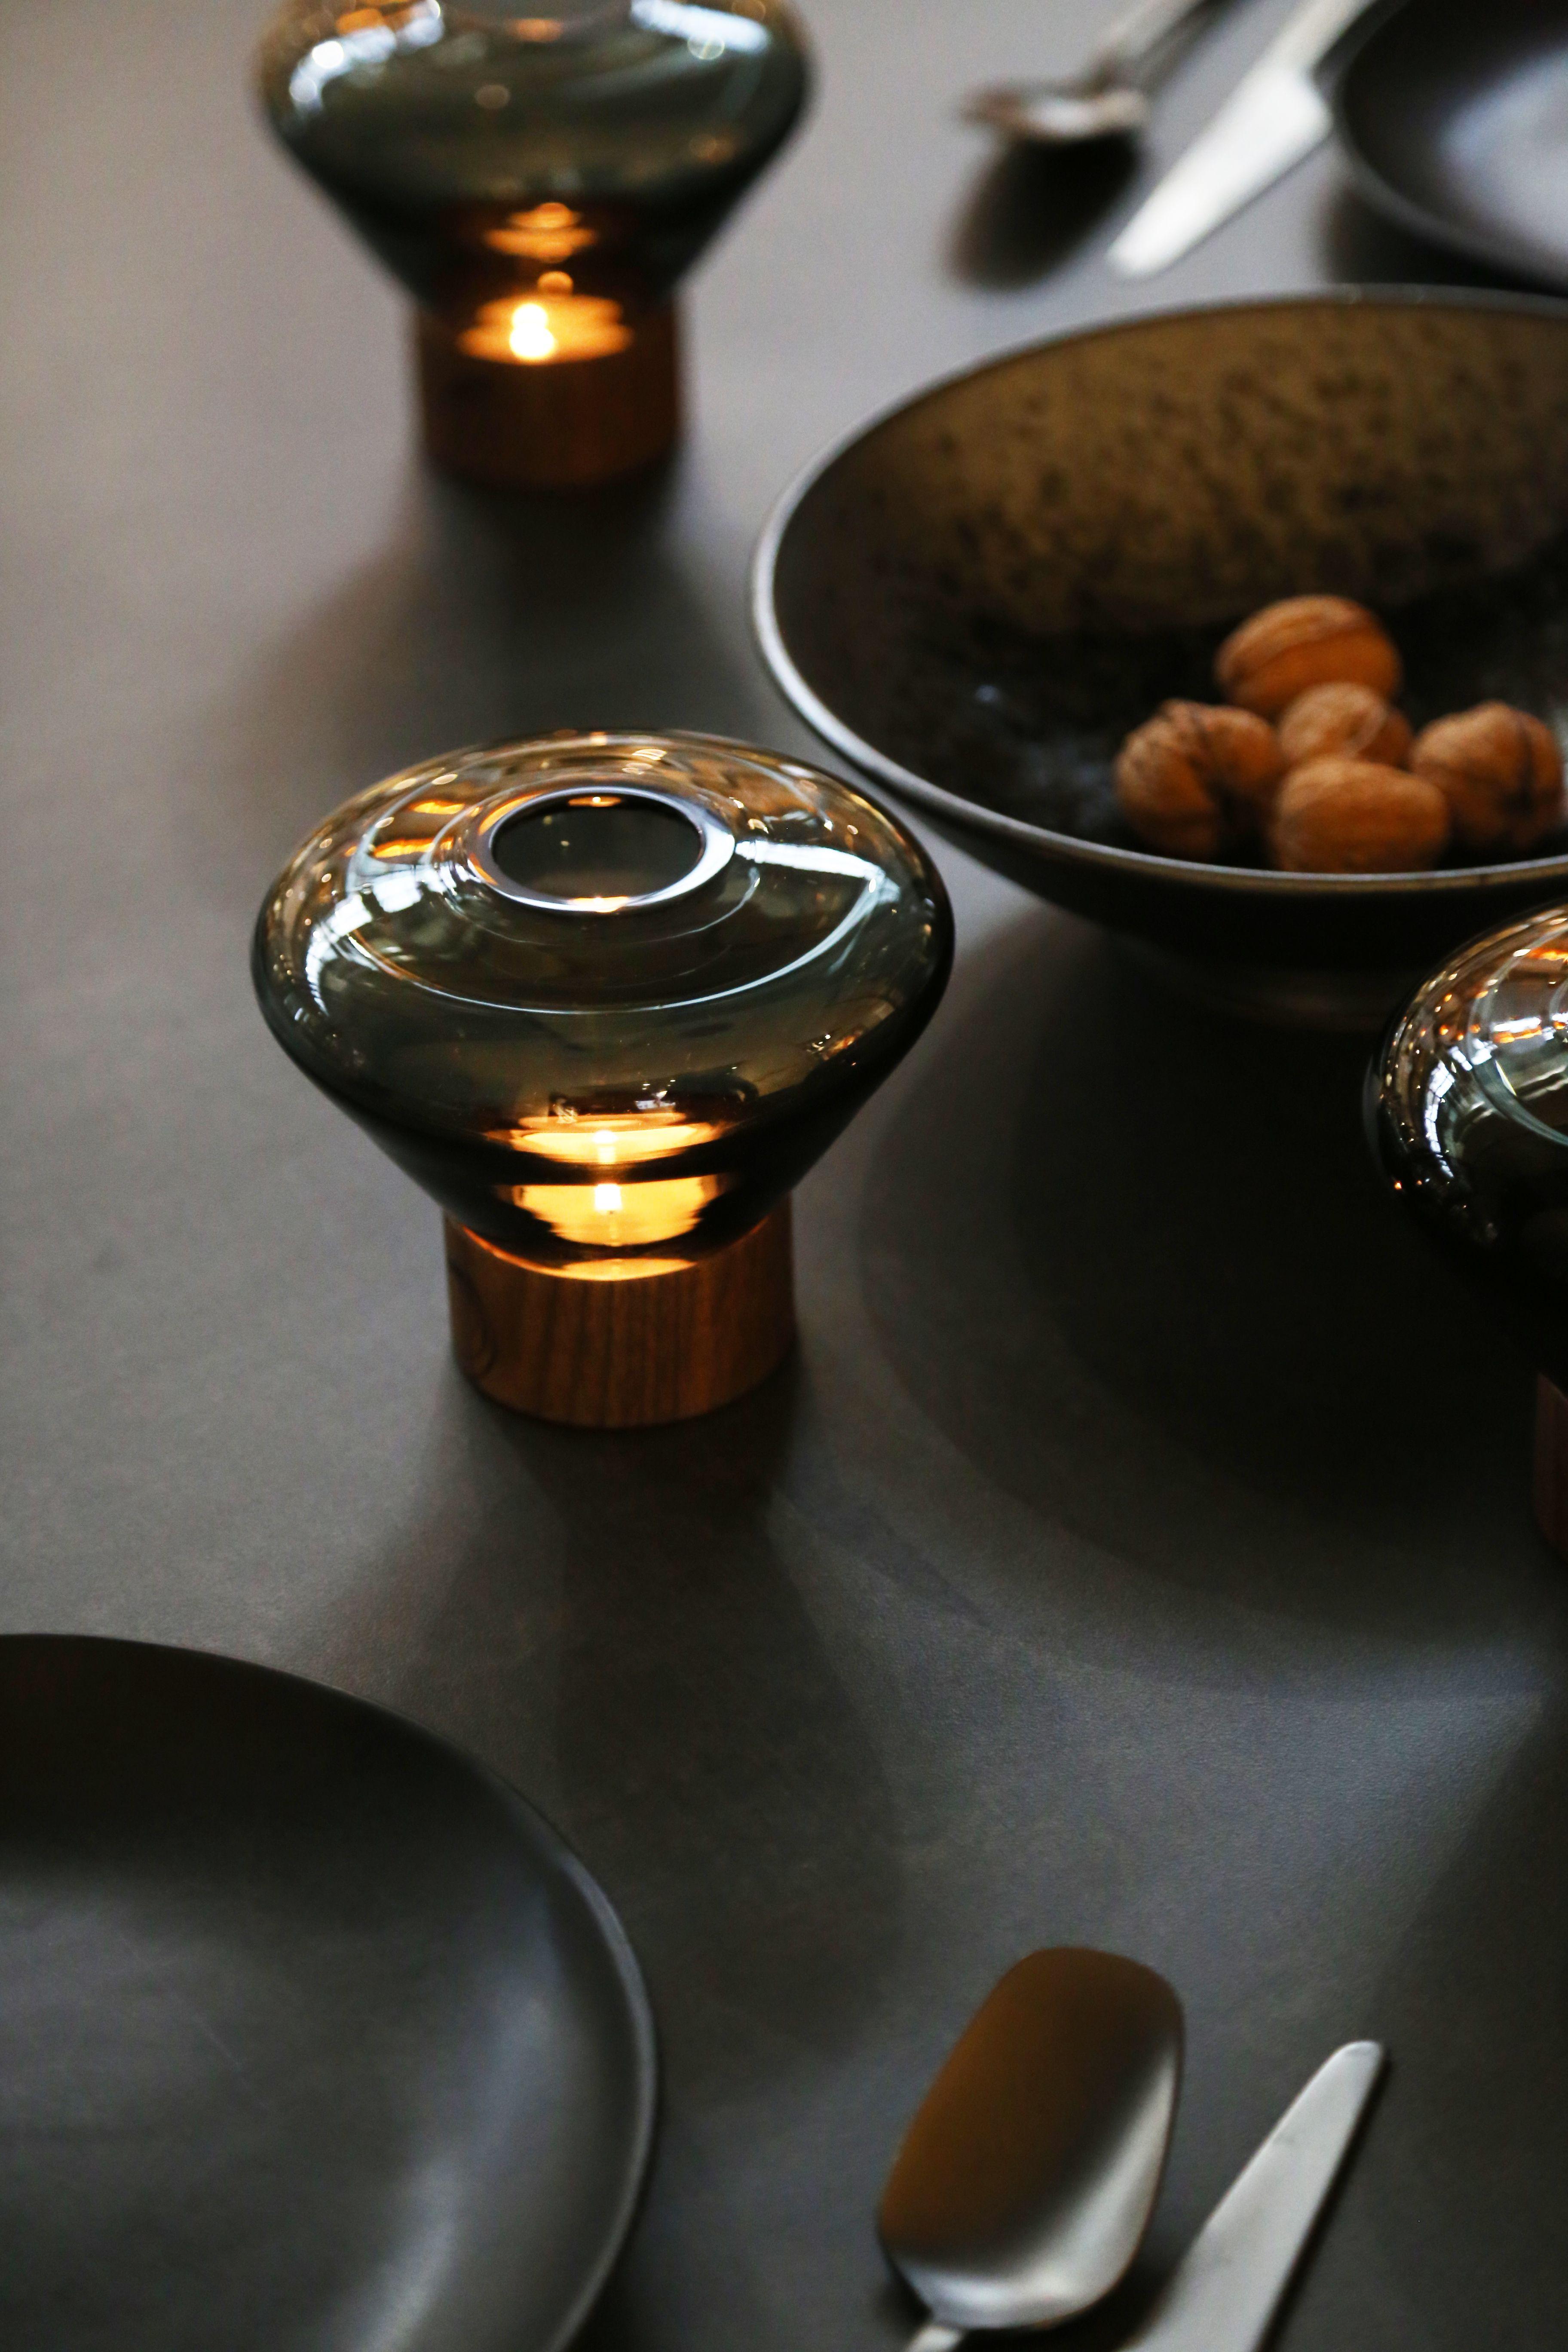 Dan Yeffet & Lucie Koldova muffins candelholder - lucie koldova & dan yeffet photo: jan